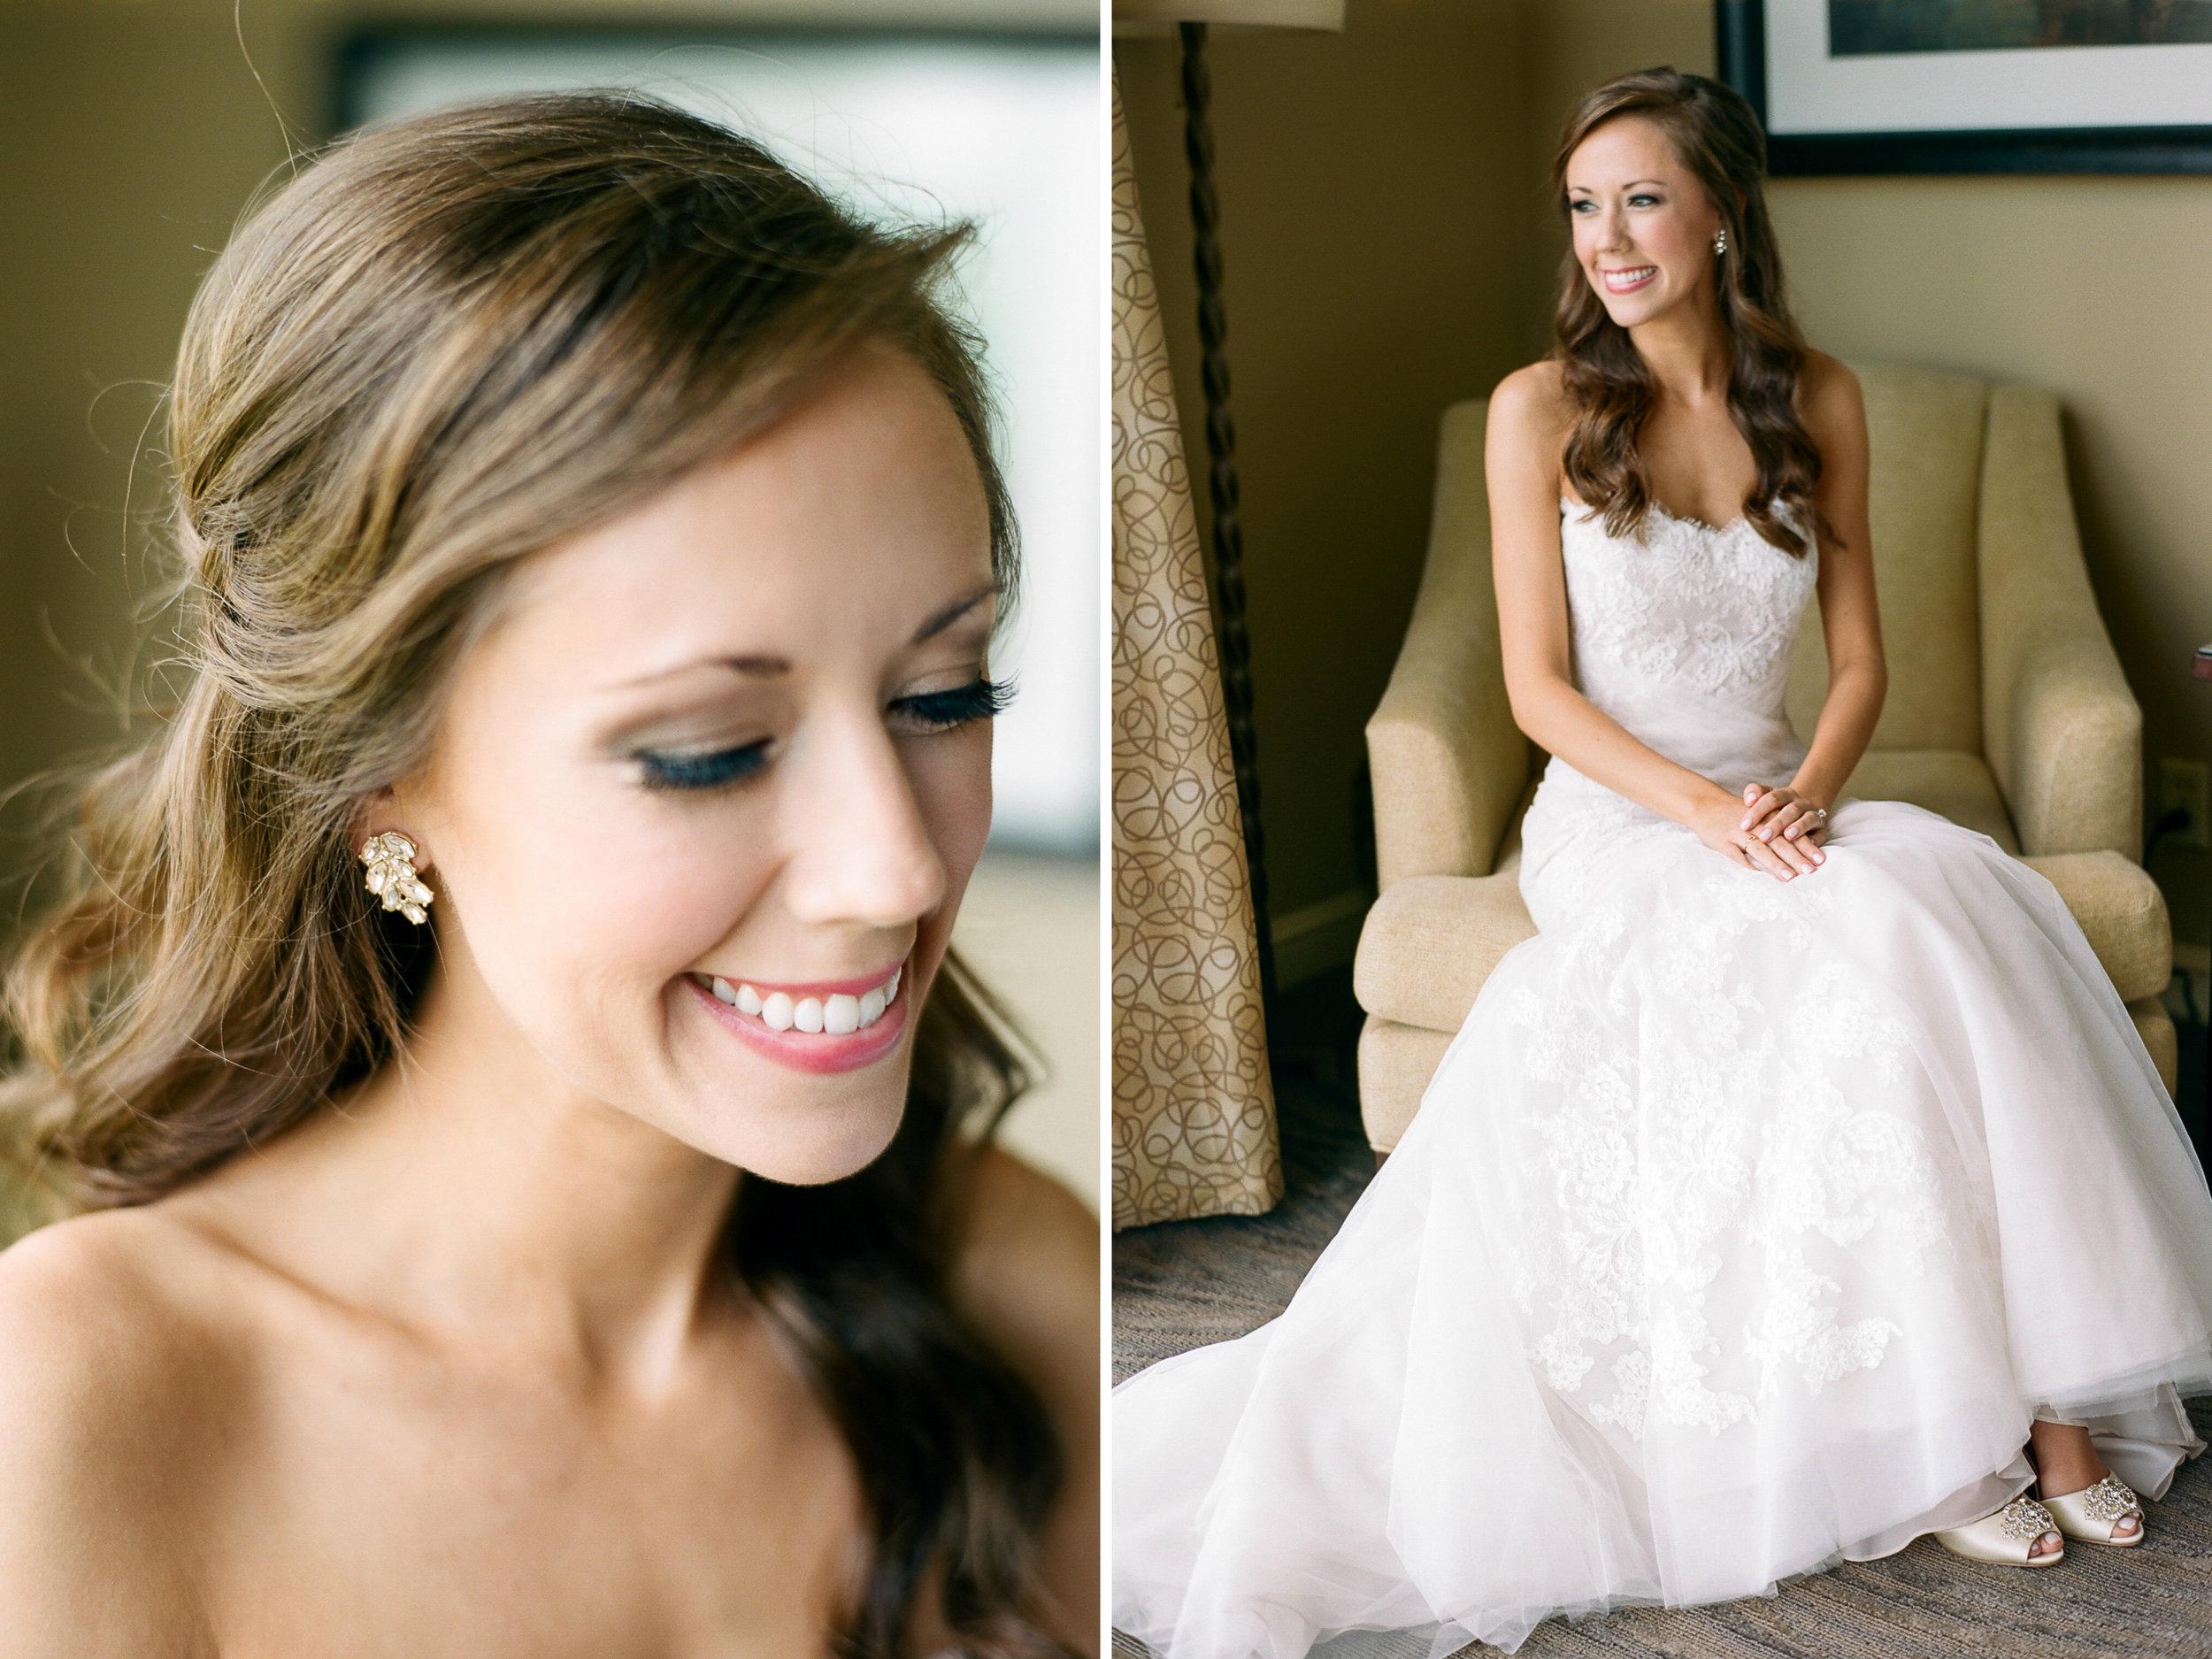 St.-Philip-Presbyterian-Church-Houston-Wedding-Ceremony-The-Junior-League-Of-Houston-Reception-Dana-Fernandez-Photography-Fine-Art-Film-104.jpg